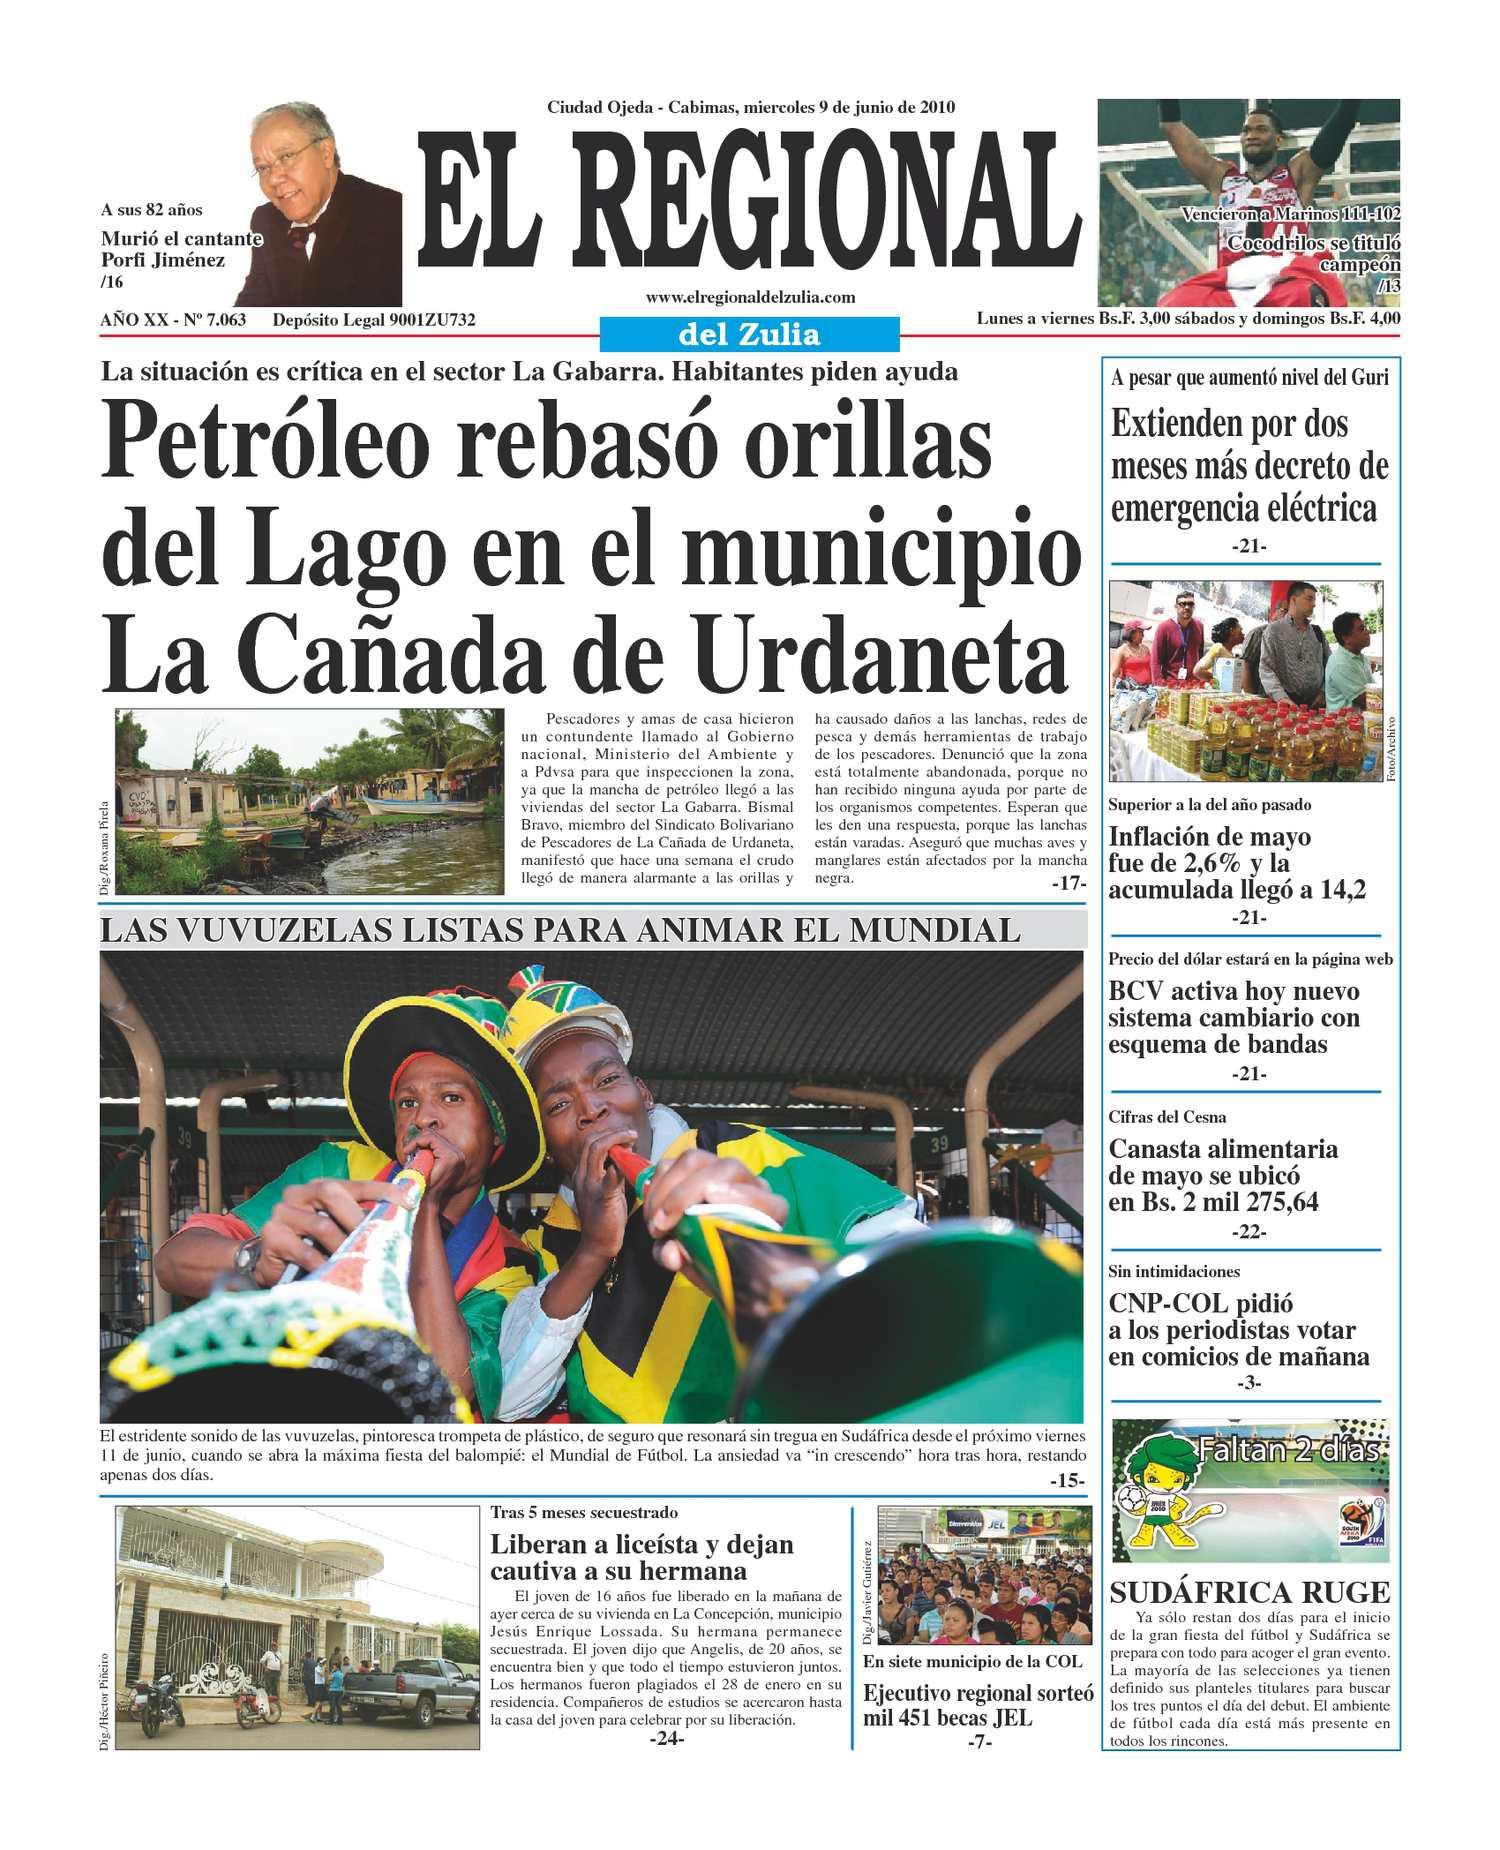 Calaméo - El Regional del Zulia 09-06-2010